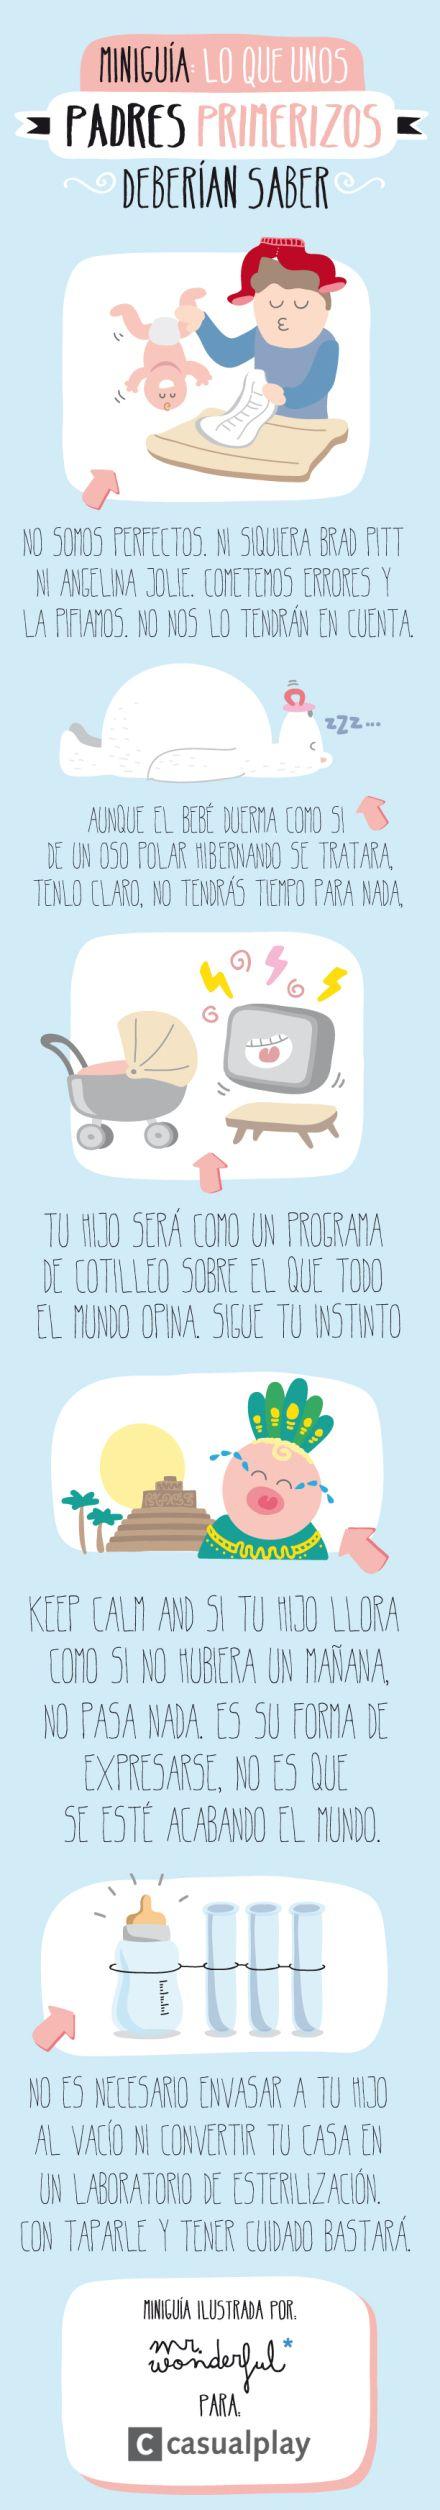 Miniguía para padres primerizos  #Premamá #Padres #Primerizos